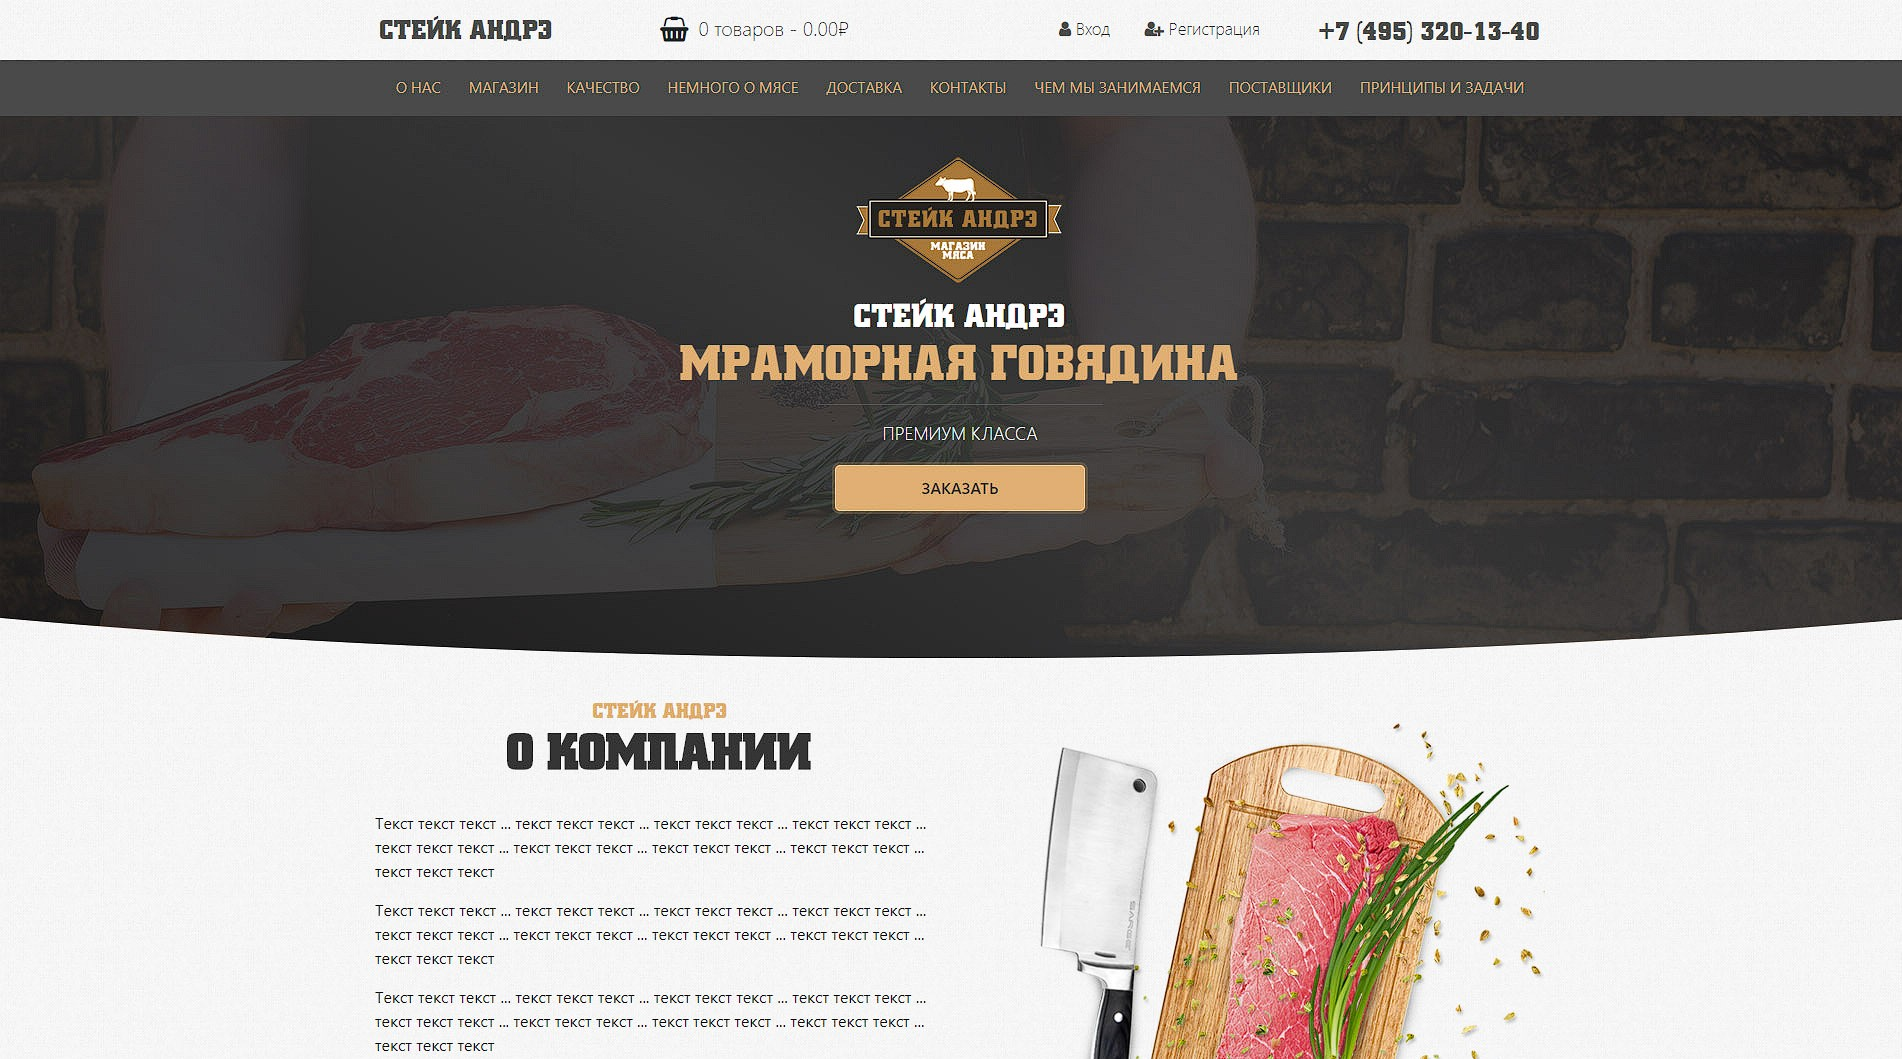 Интернет-магазин Стейк Андрэ